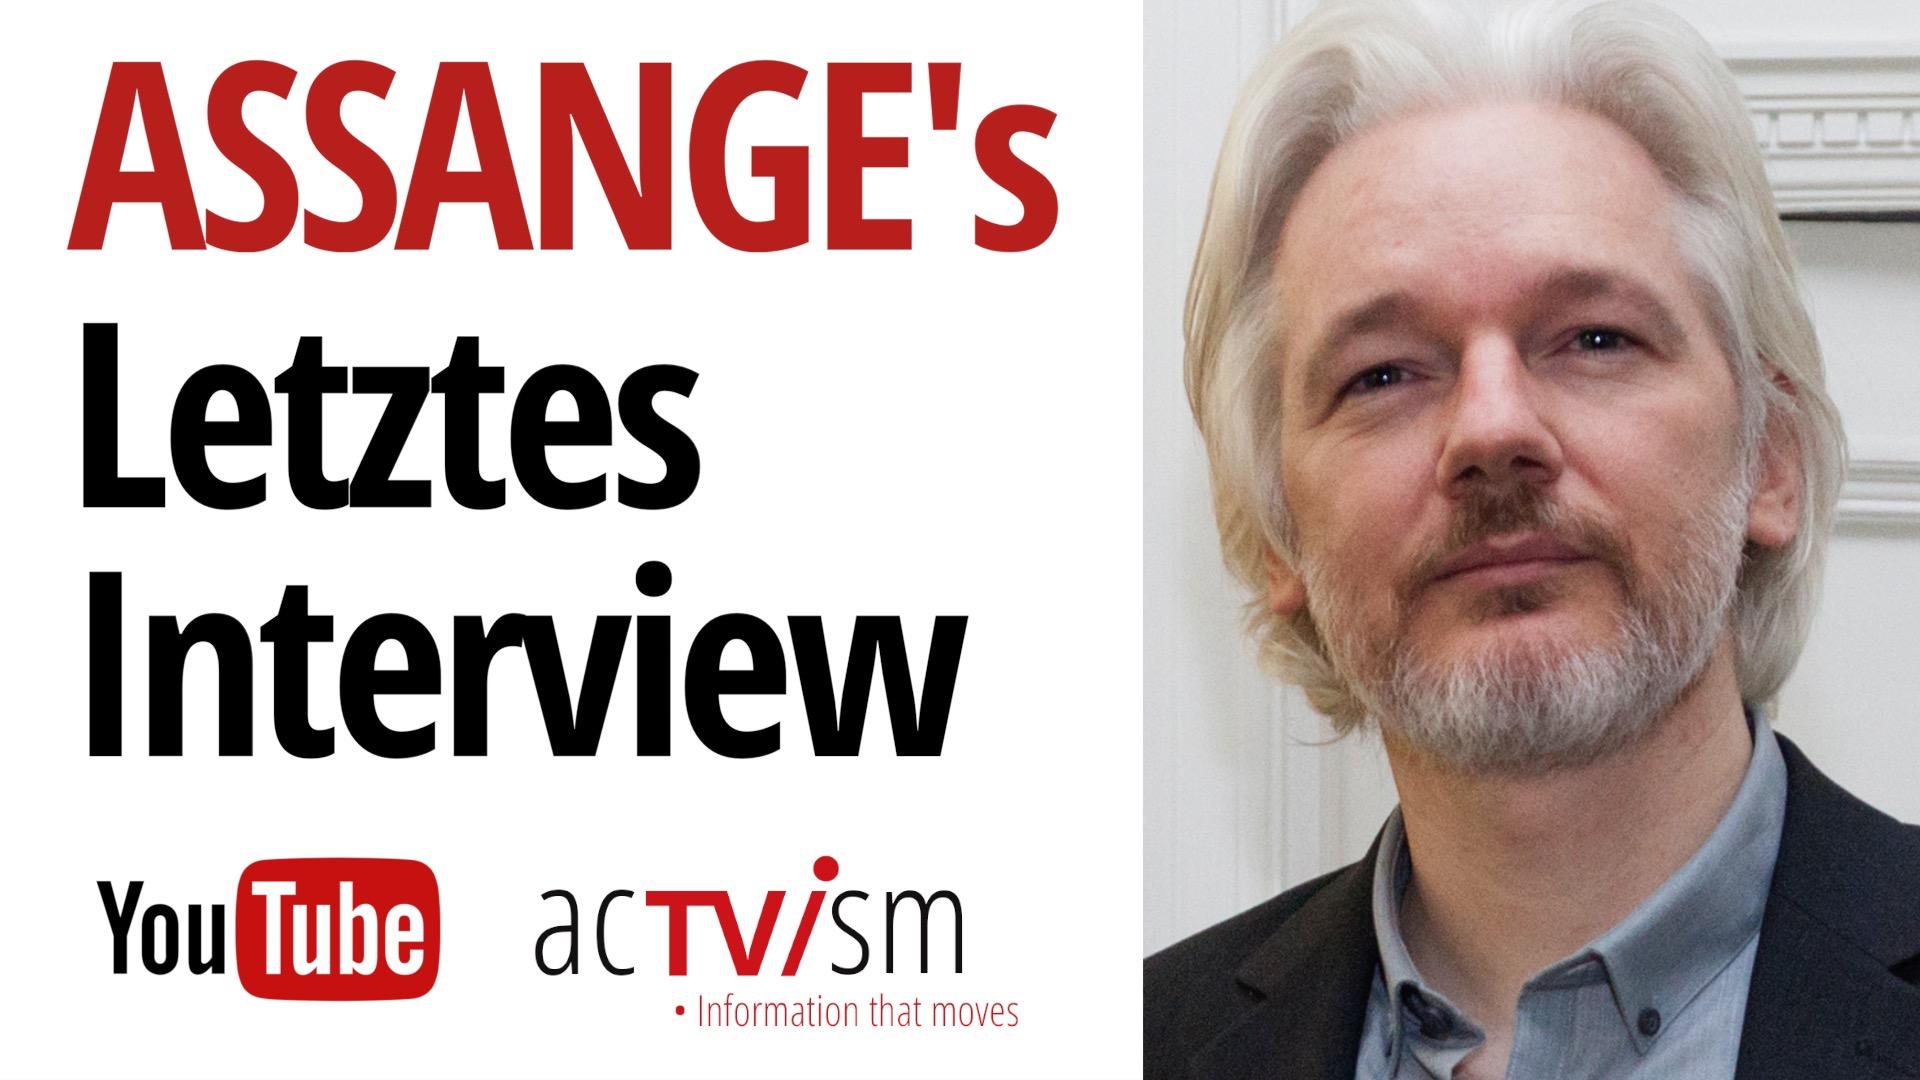 Julian Assange's letztes Interview